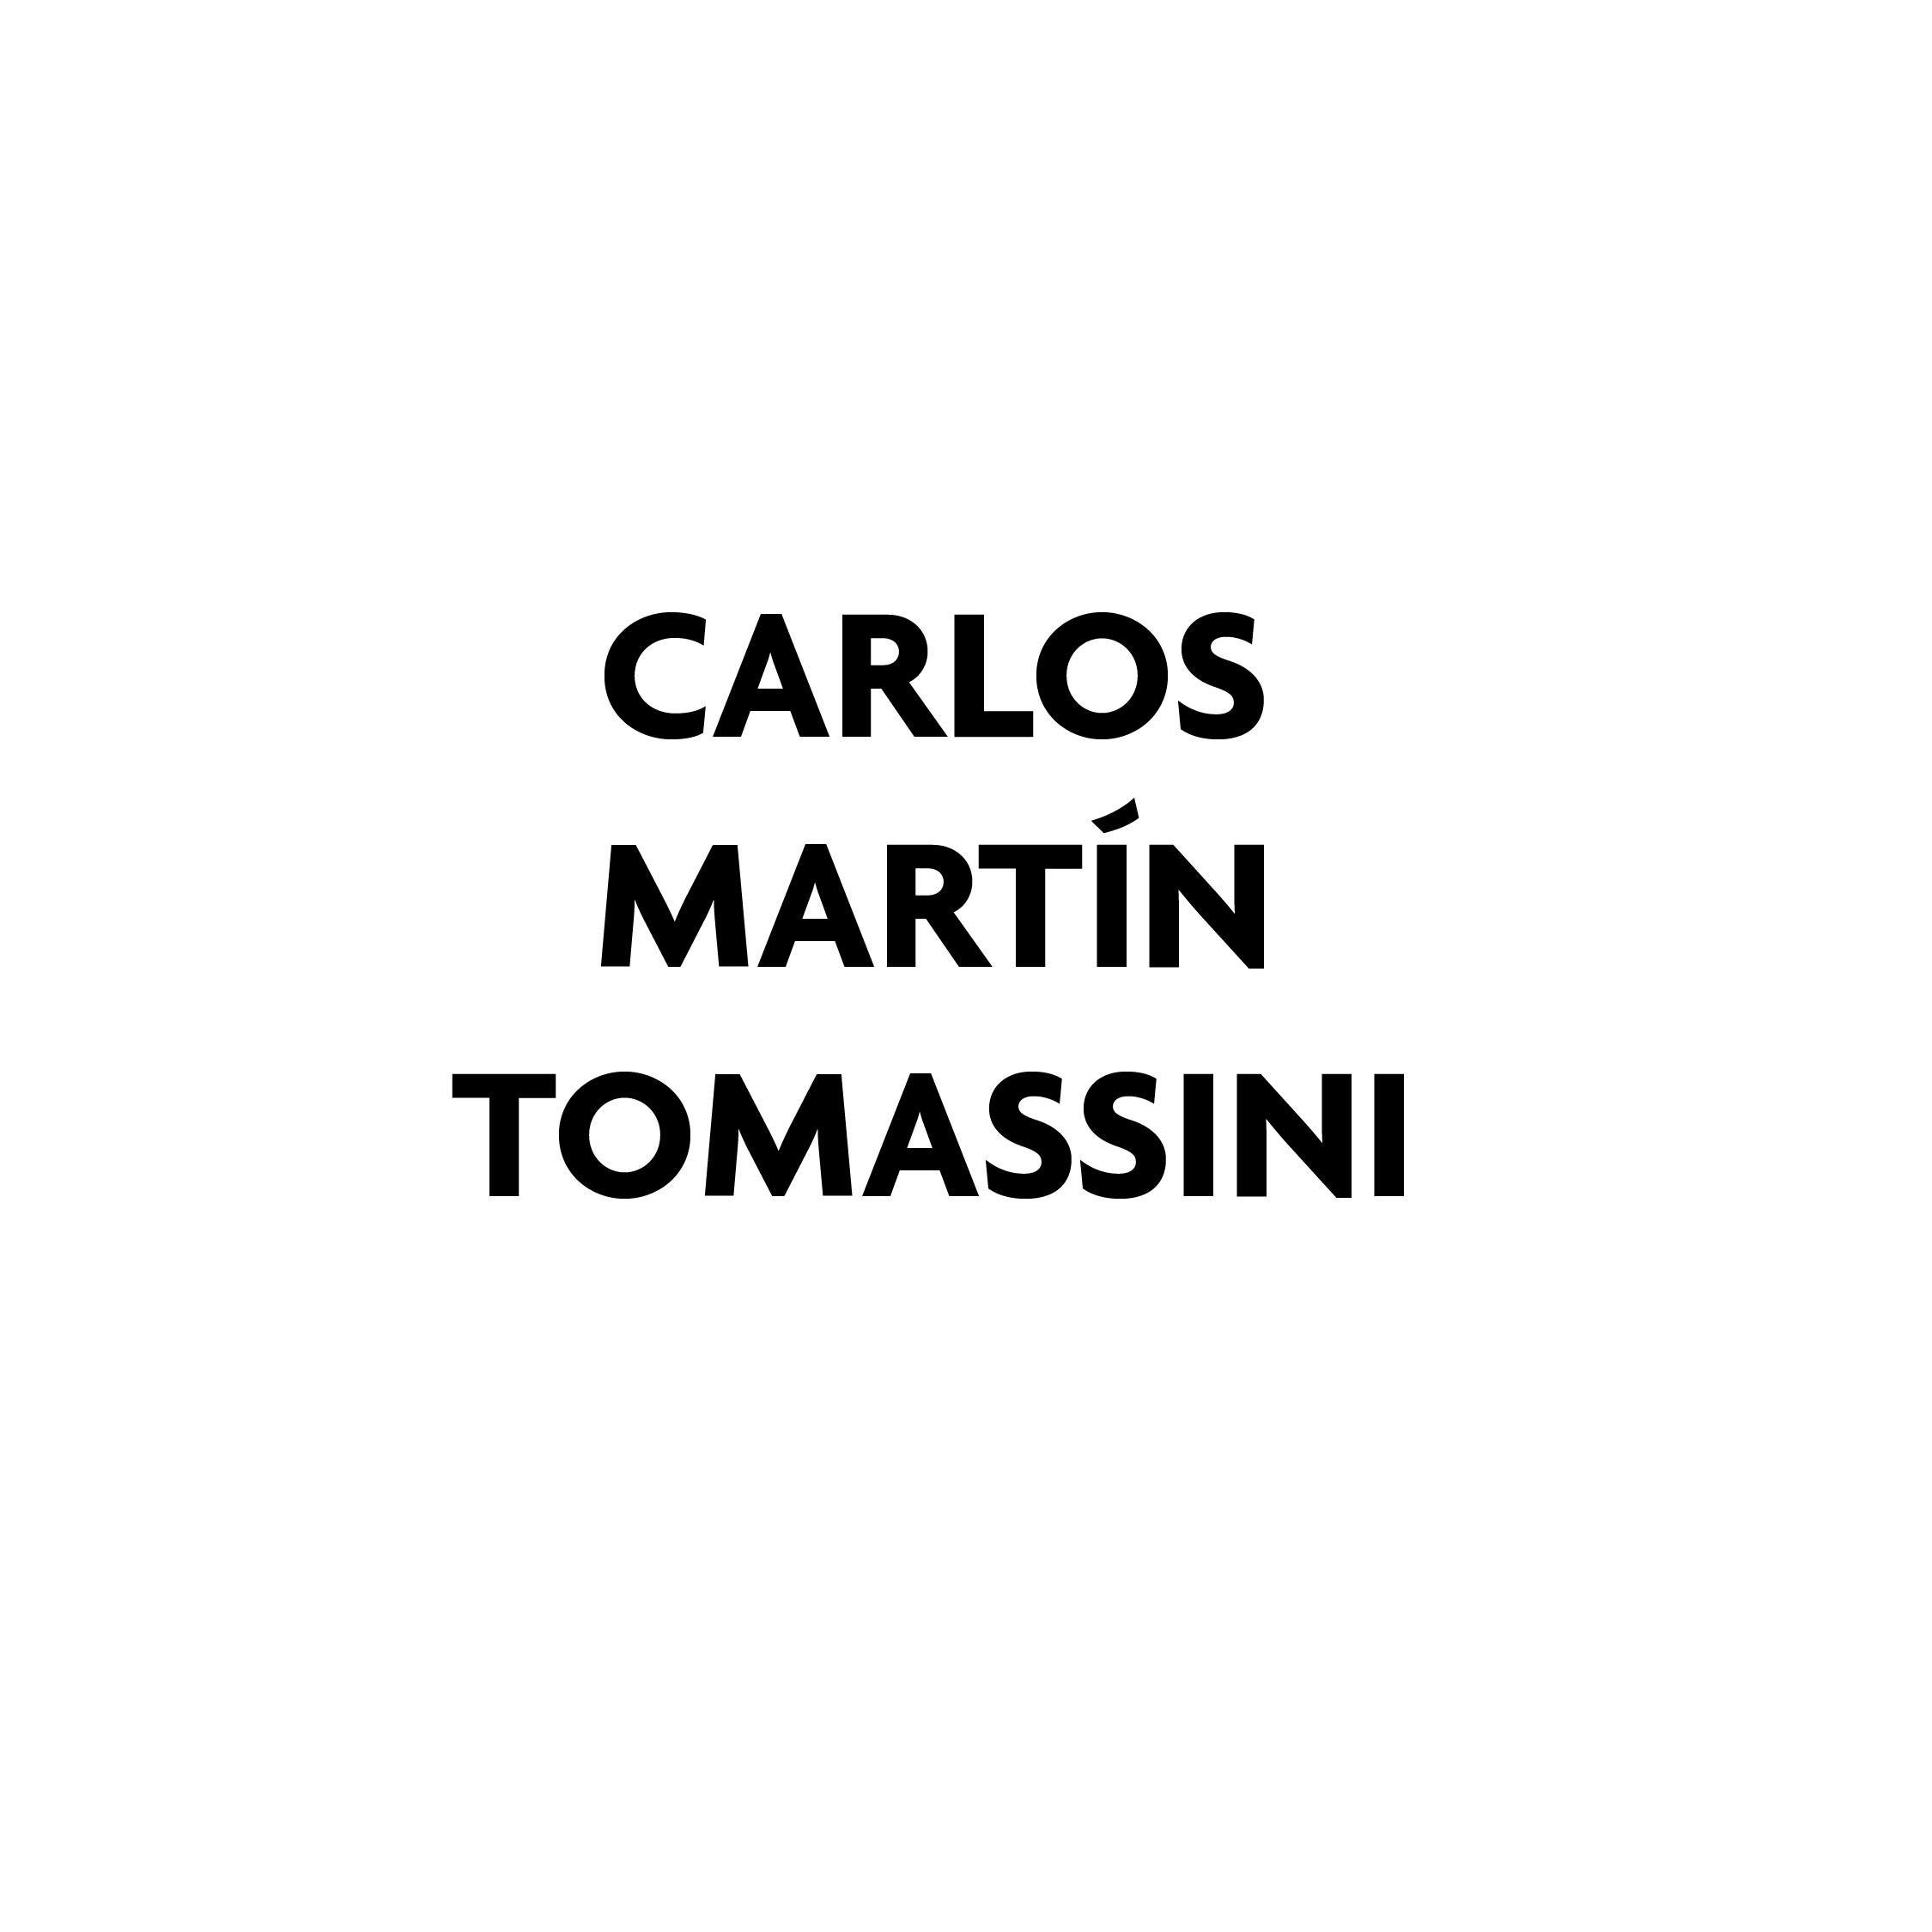 Carlos Martín Tomassini